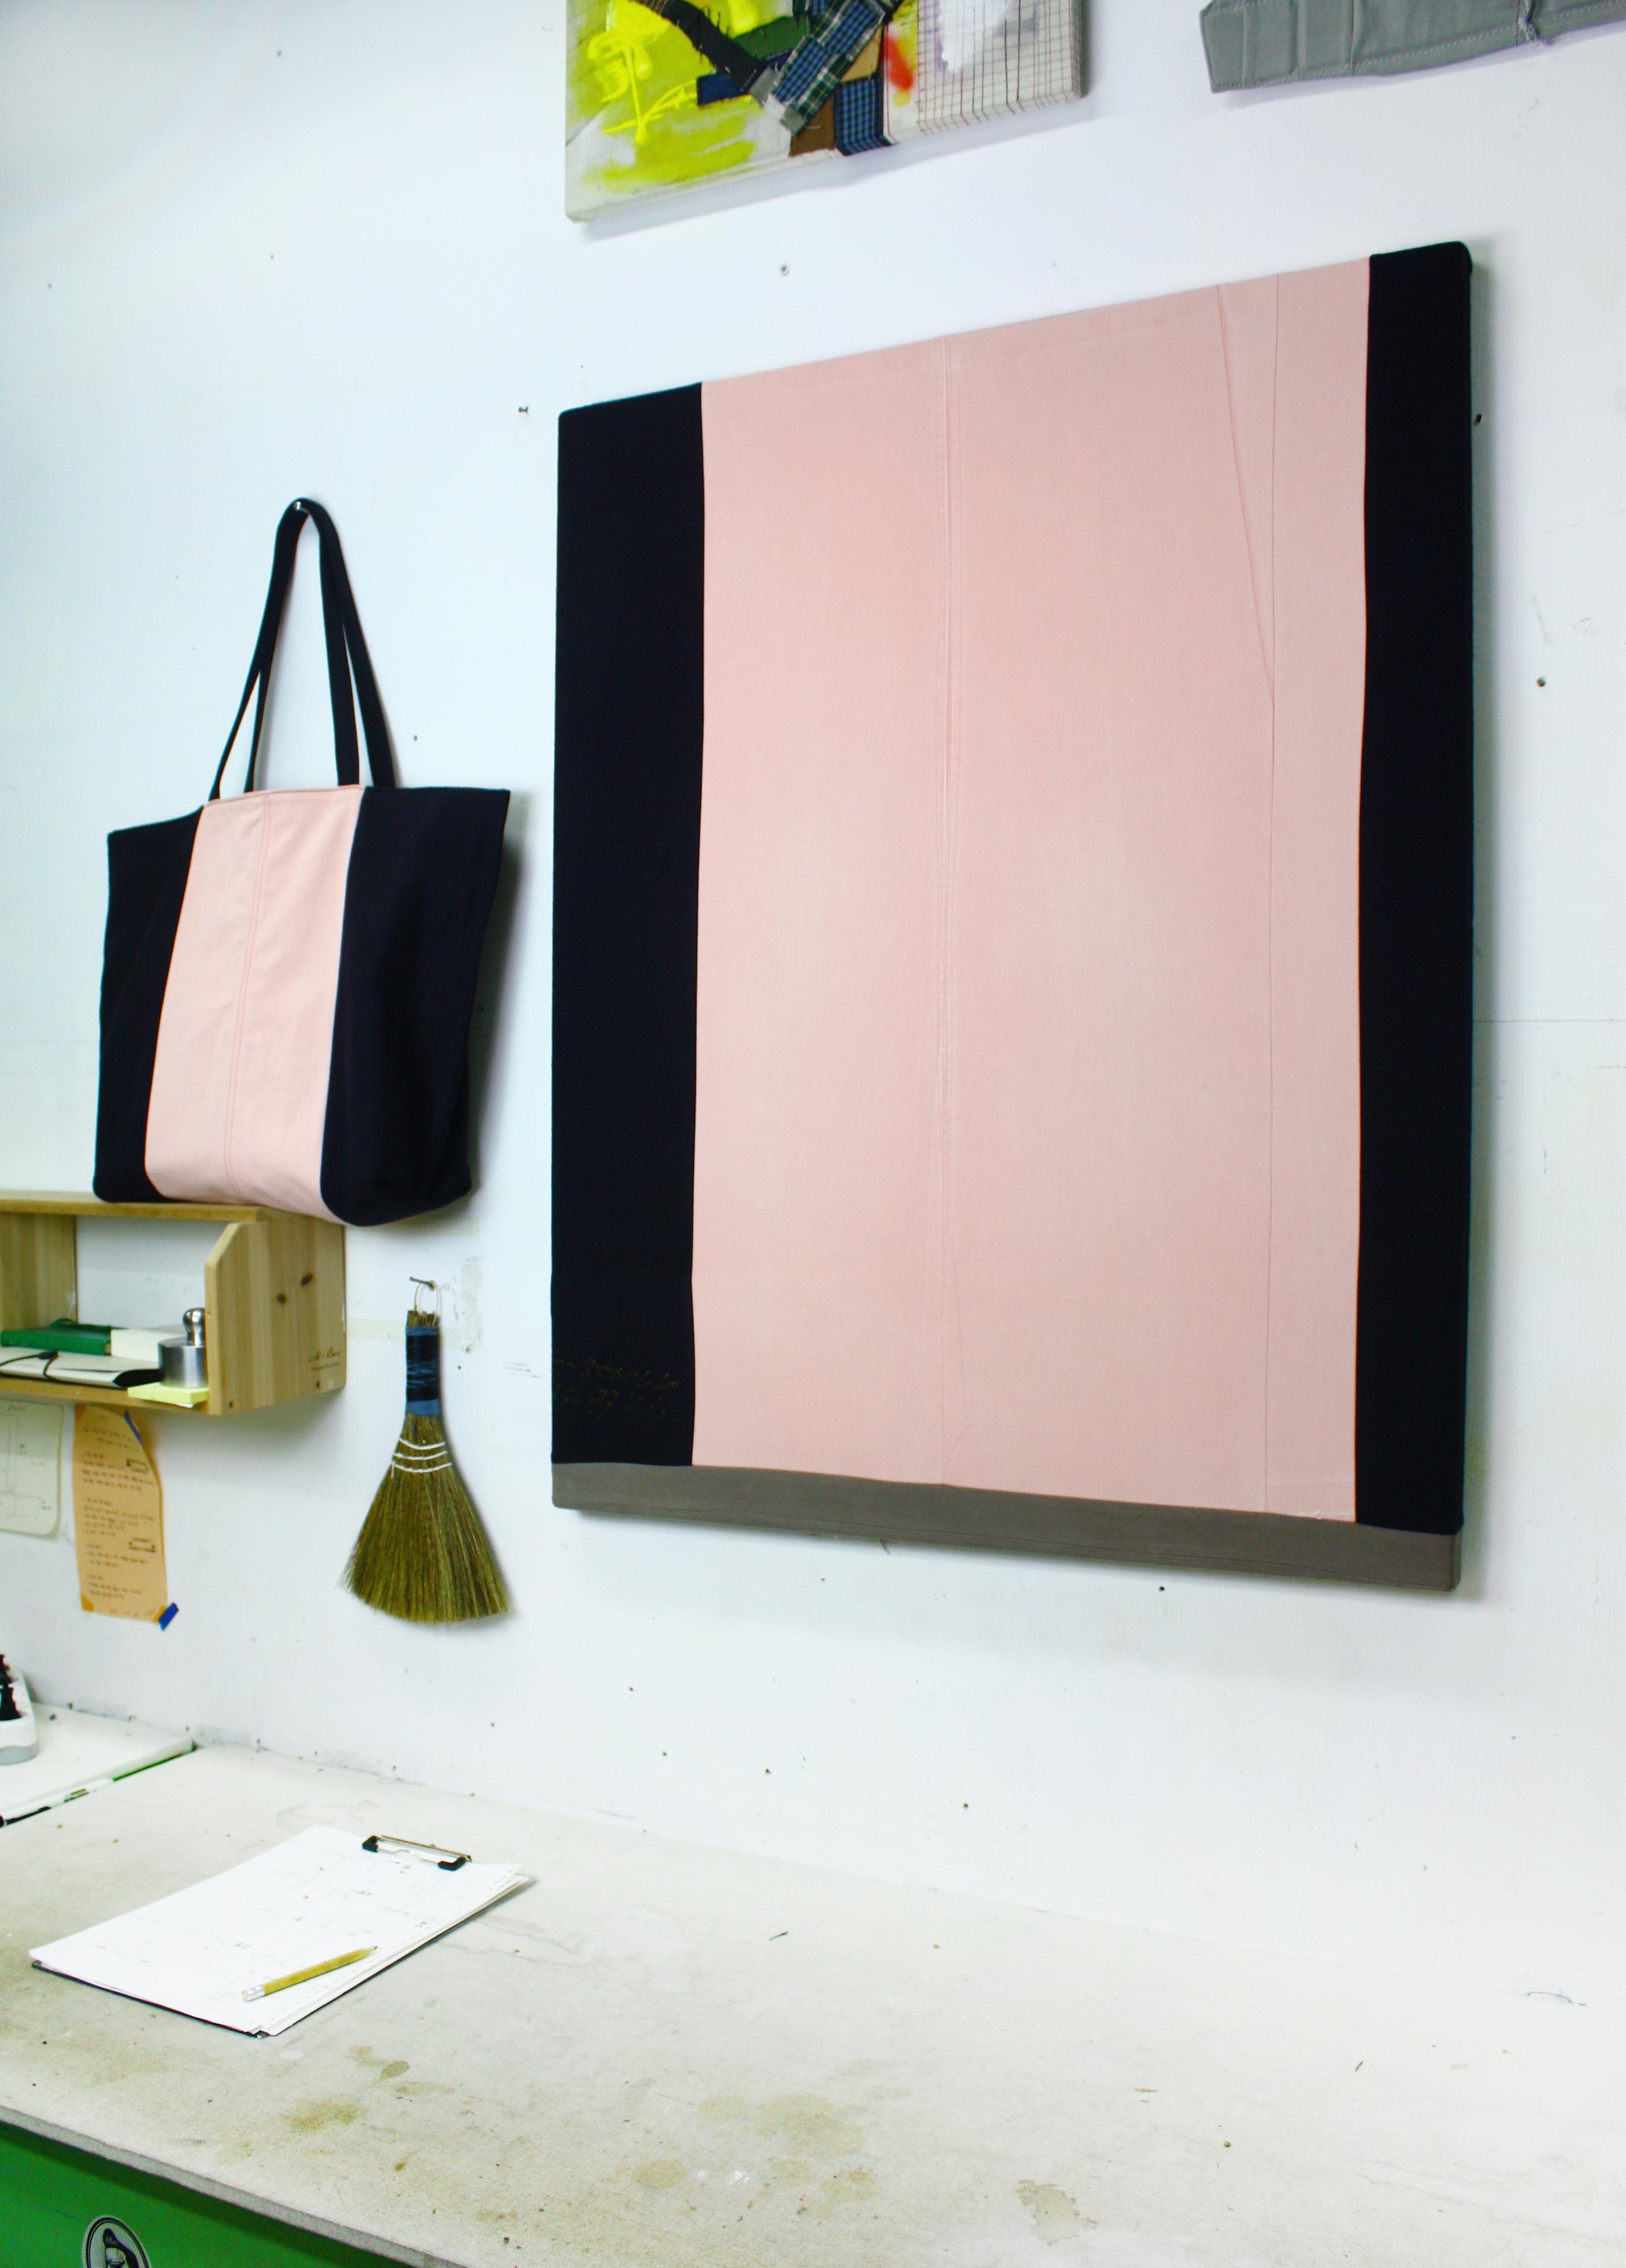 Bag_Art(Flamingo), fabric bag and canvas, 2017, 73x92